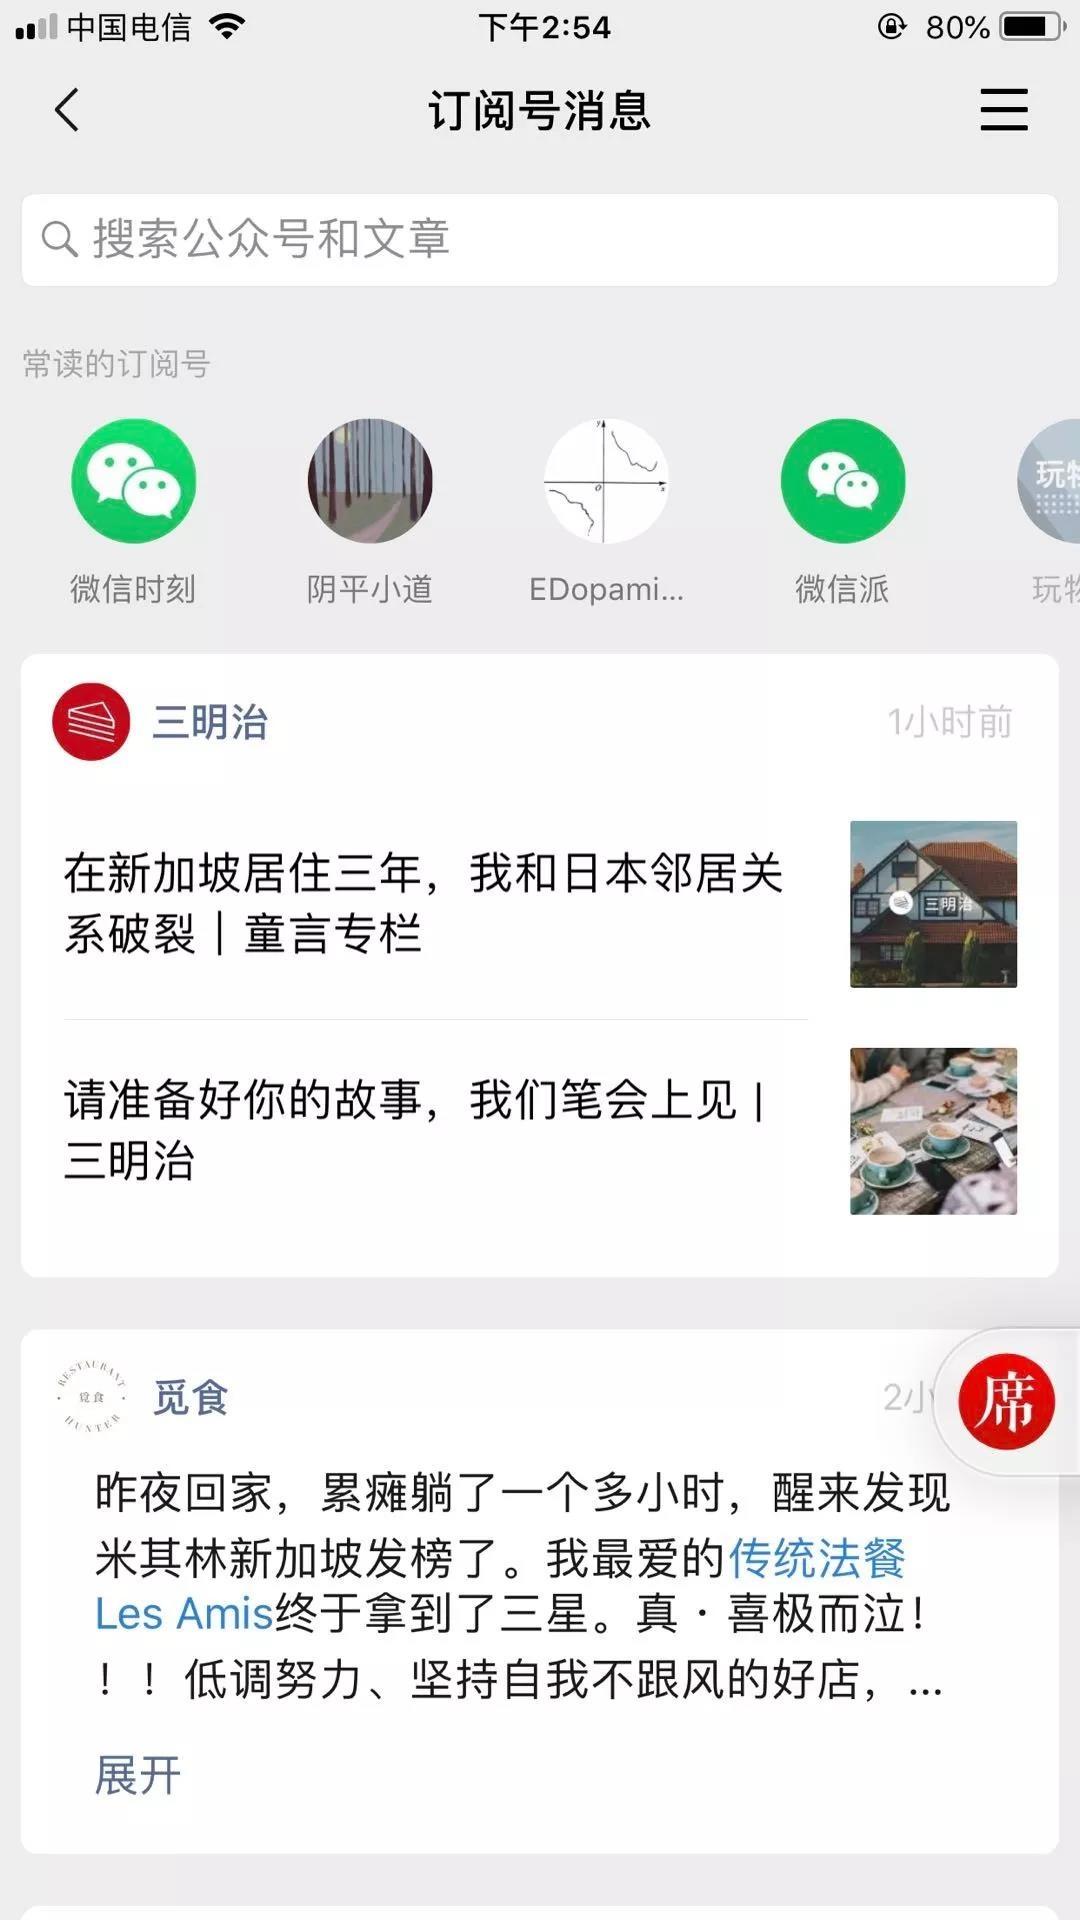 微信7.0.7更新:表情包